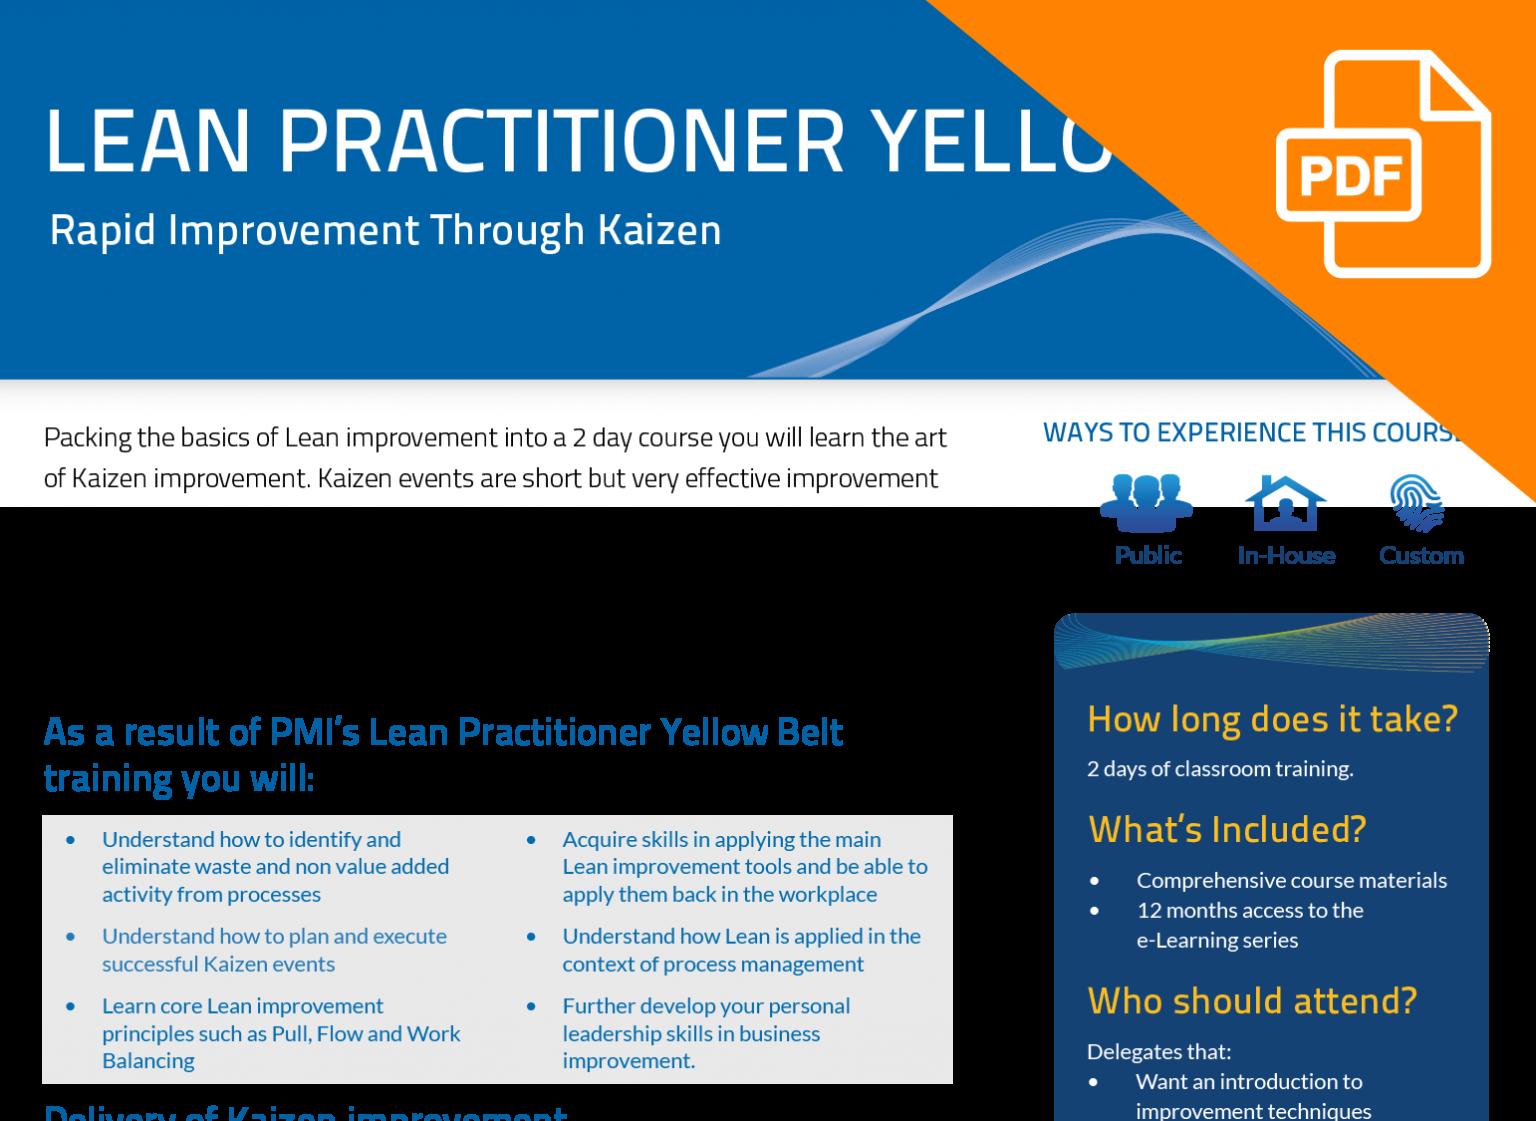 FLYER: Lean Practitioner Yellow Belt